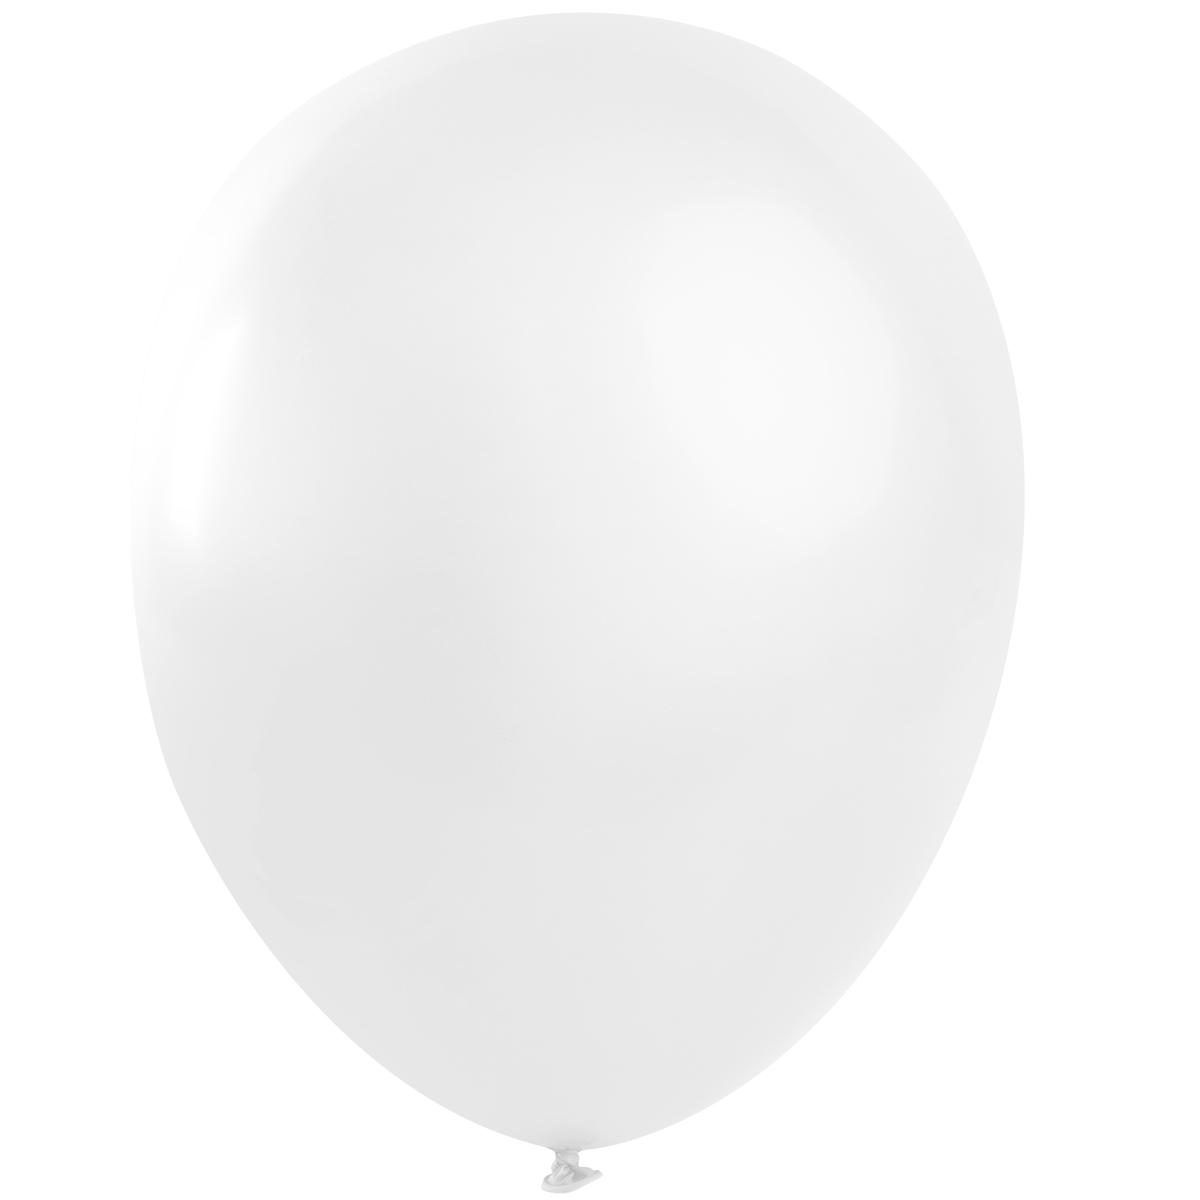 Ballong lösvikt, Vit